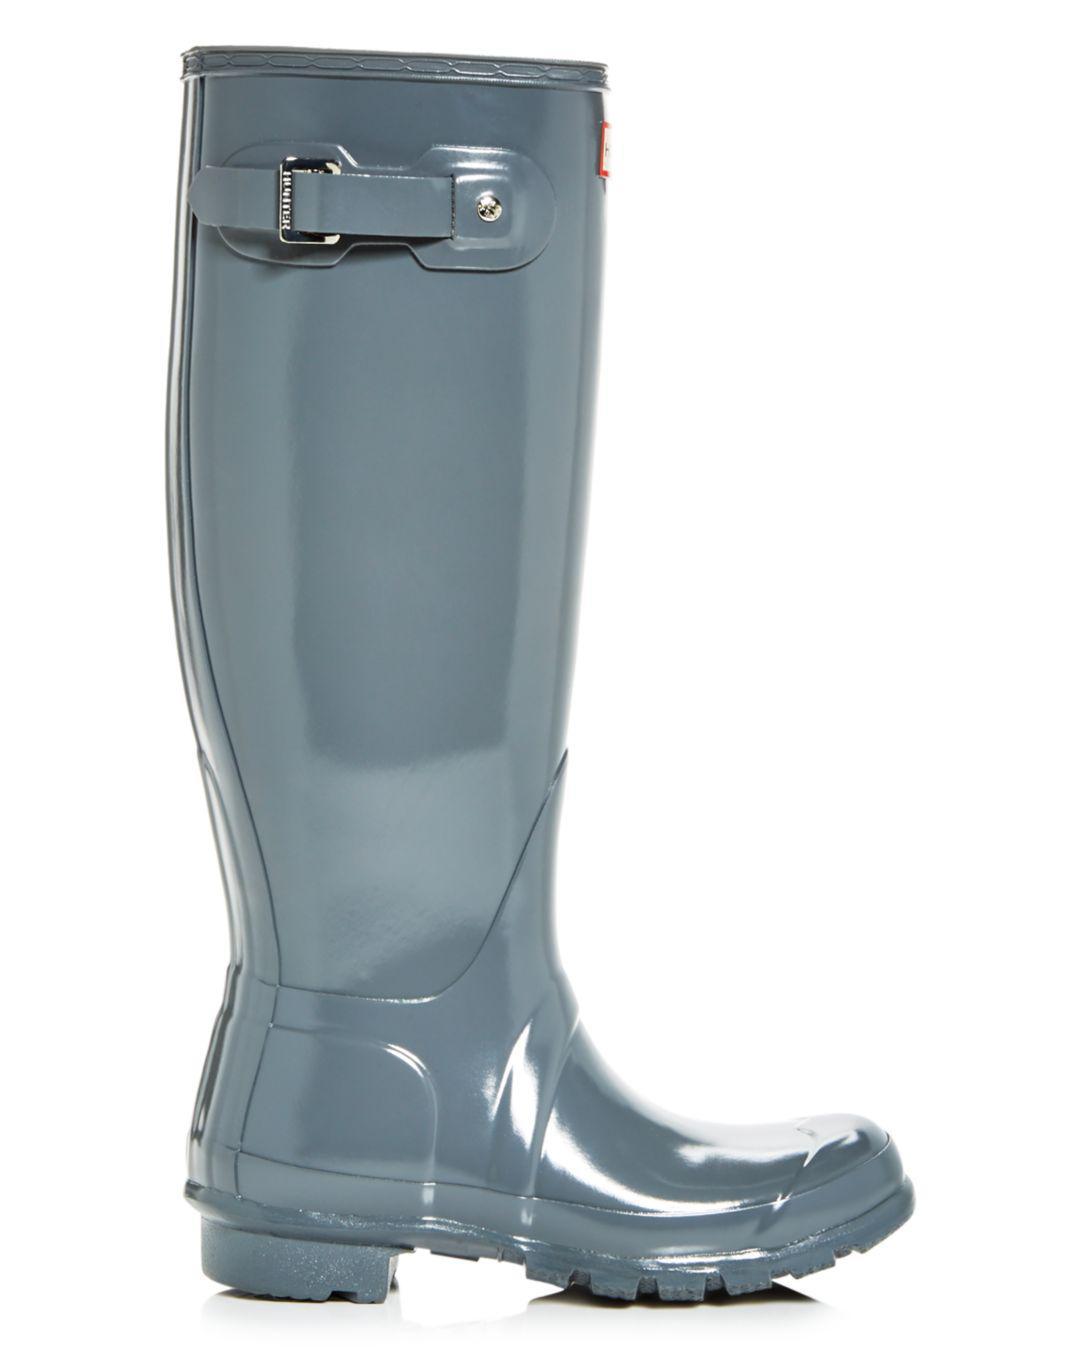 b469e6933d42 Lyst - HUNTER Women s Original Tall Gloss Rain Boots in Gray - Save 6%